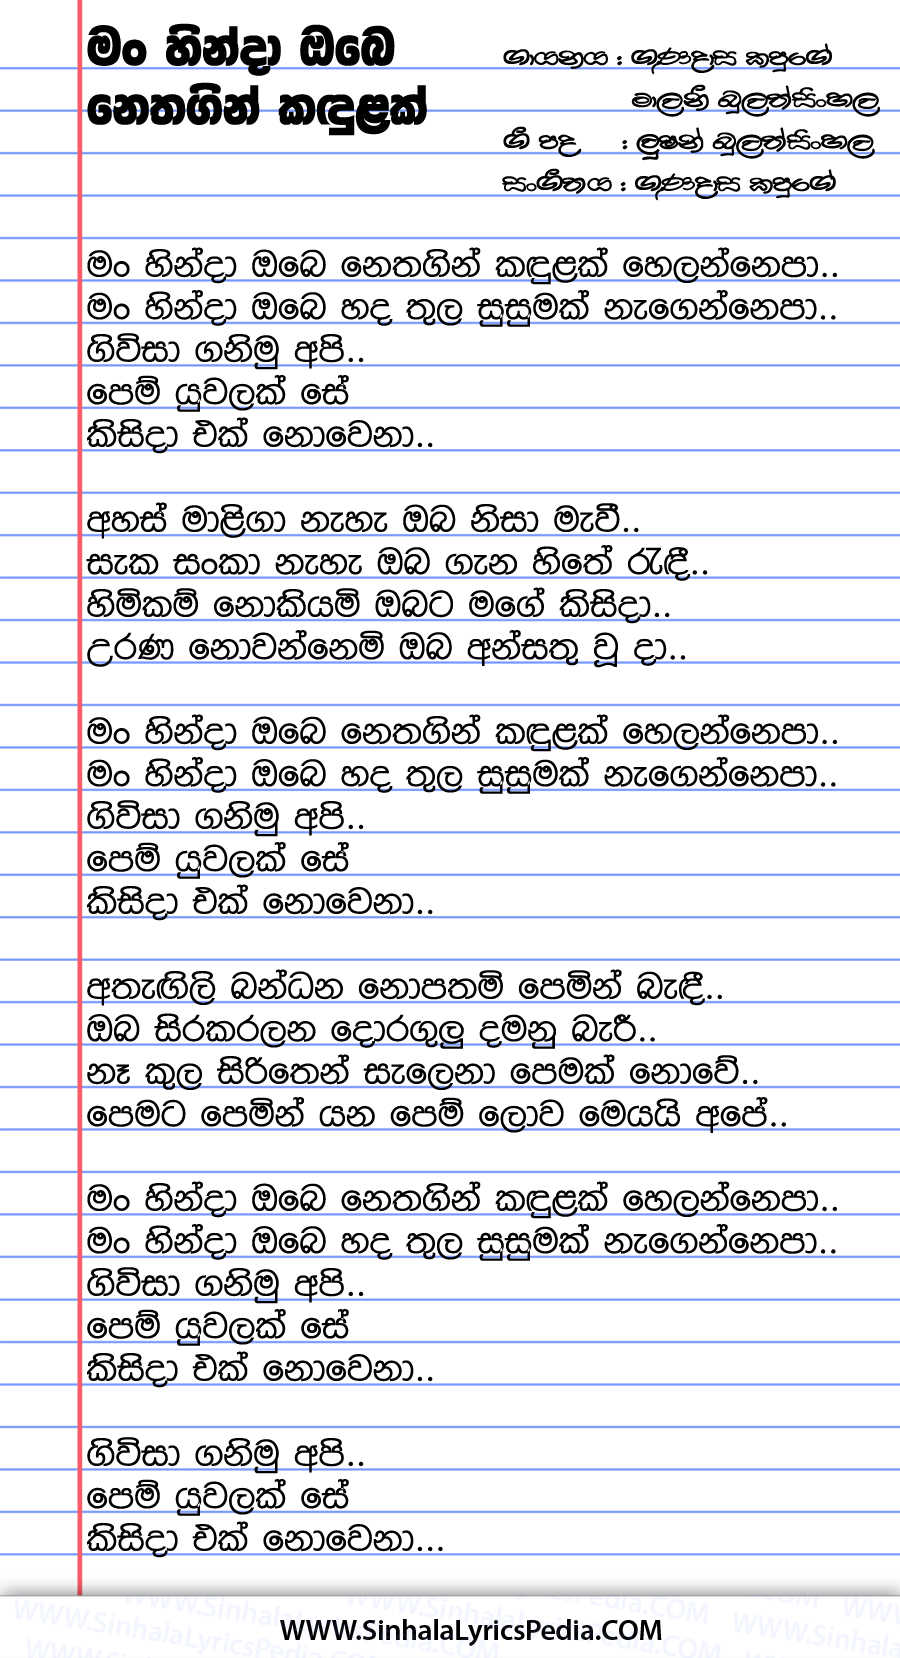 Man Hinda Obe Nethagin Kandulak Song Lyrics